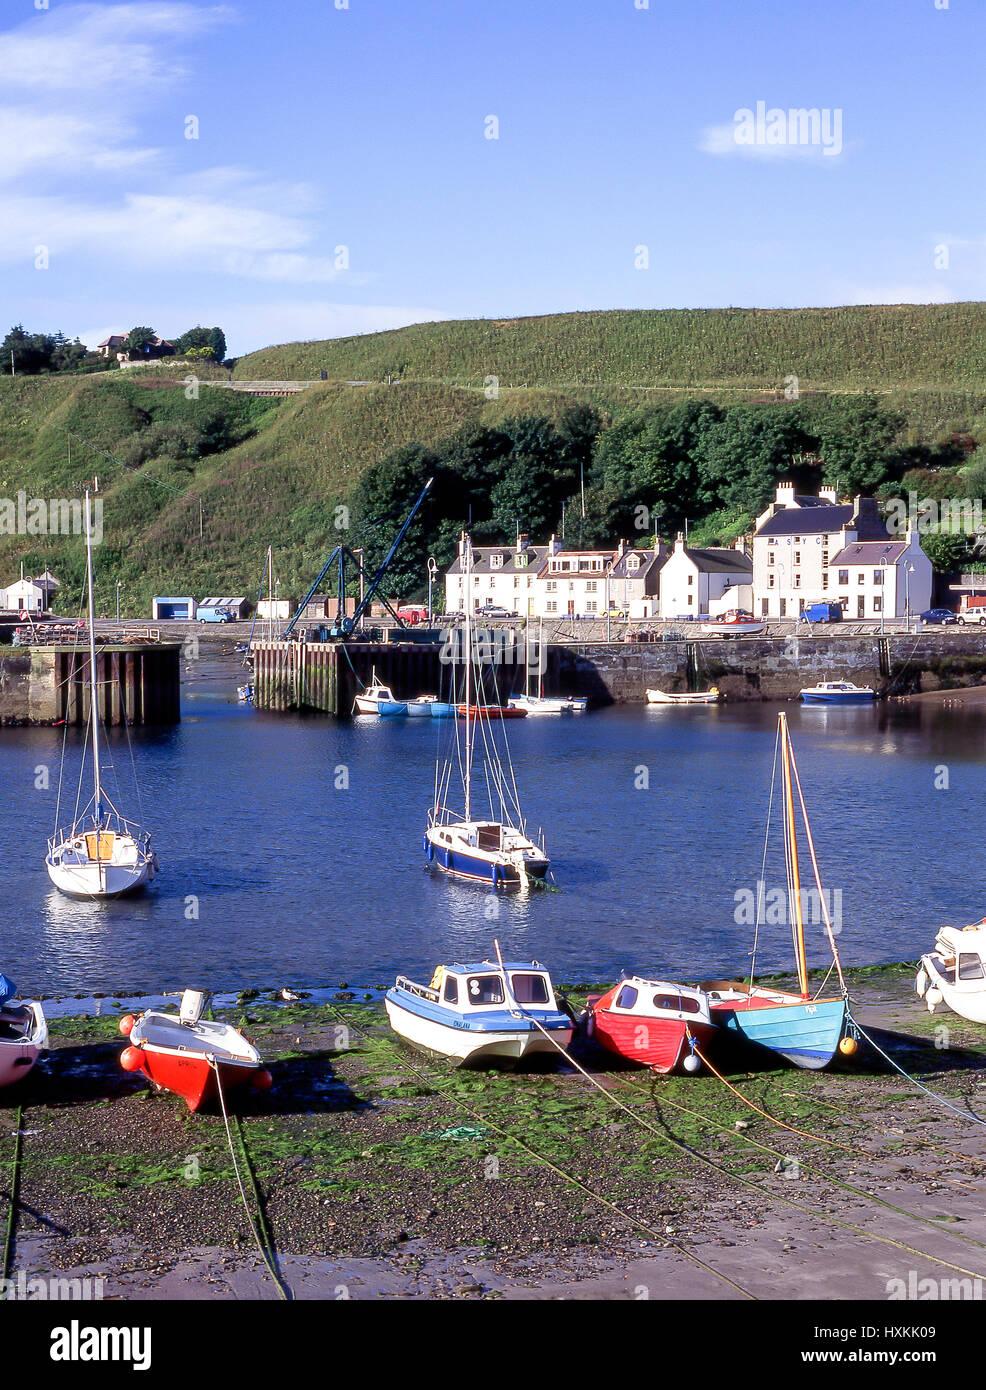 Harbour view, Stonehaven, Aberdeenshire, Scotland, United Kingdom - Stock Image